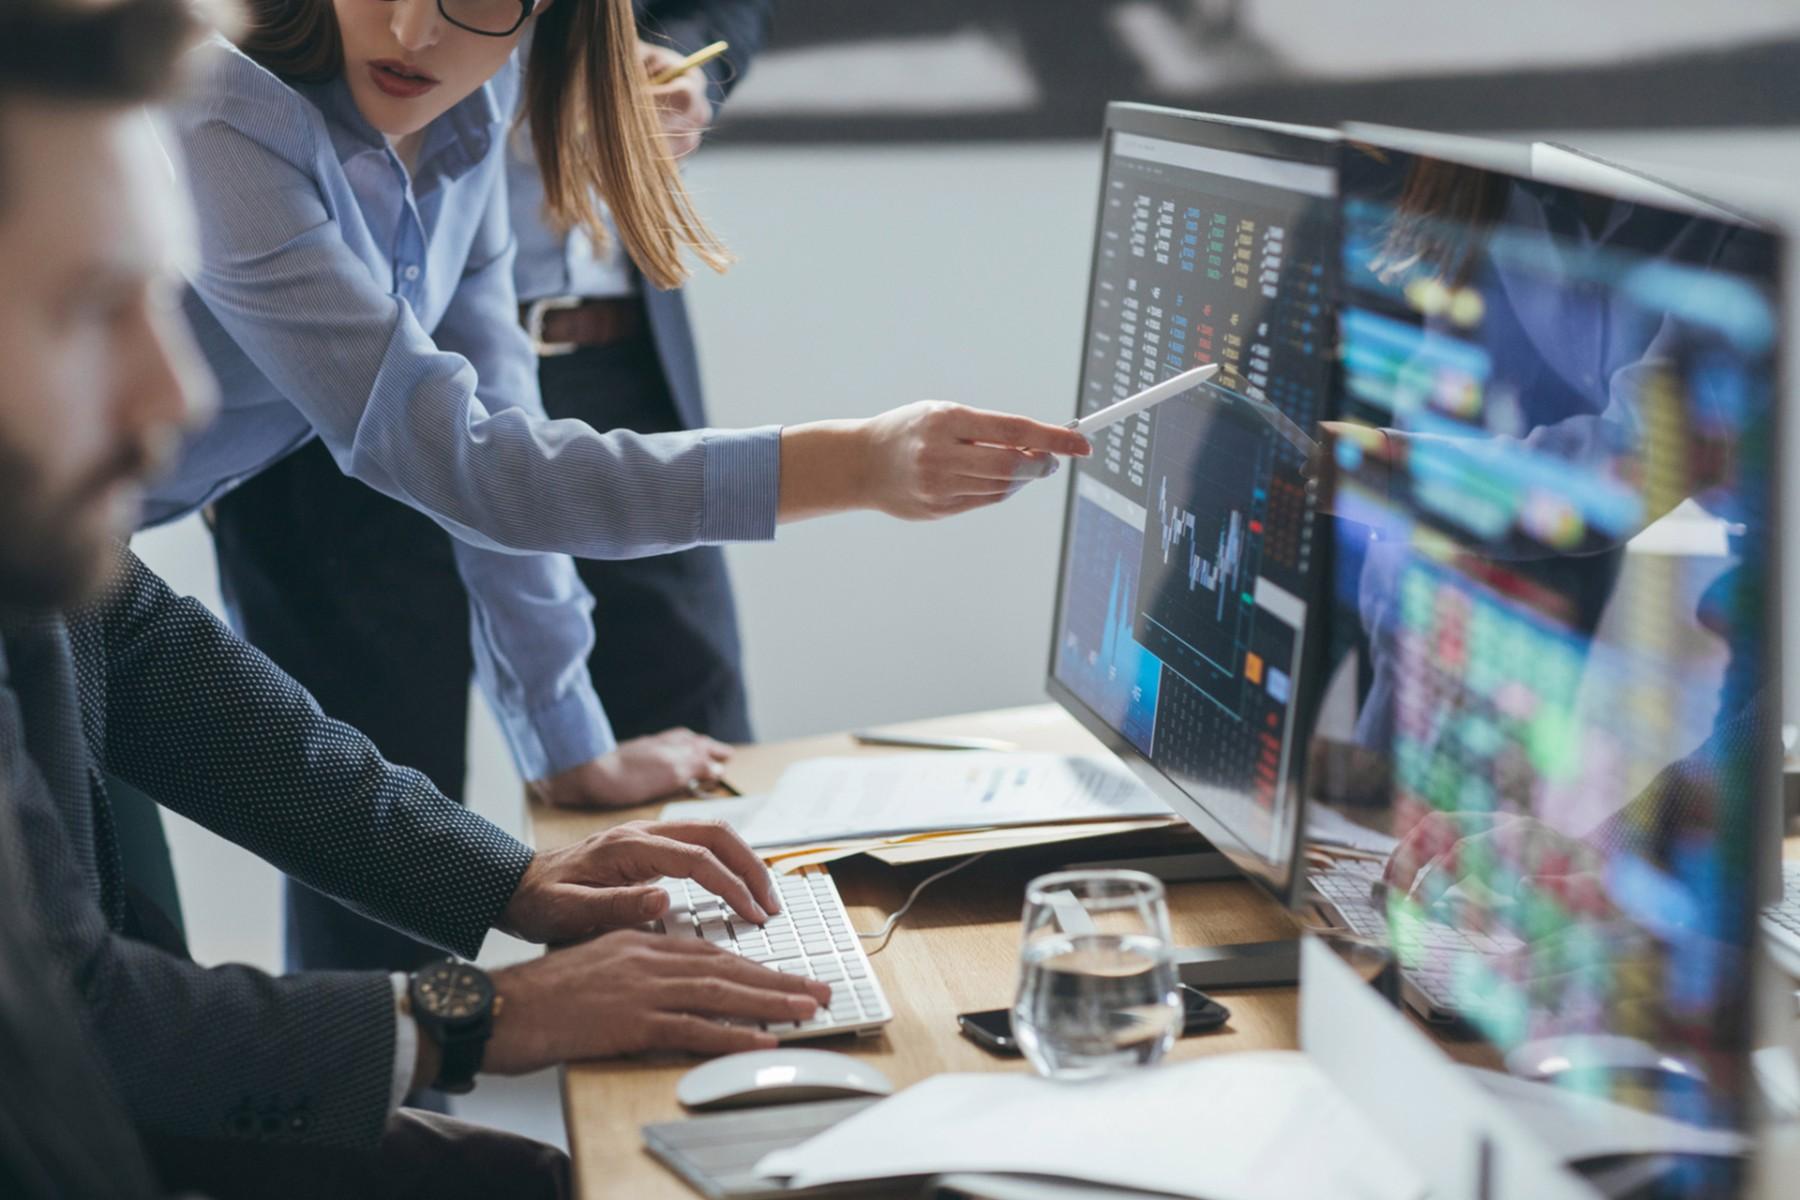 brokers analysing stock market